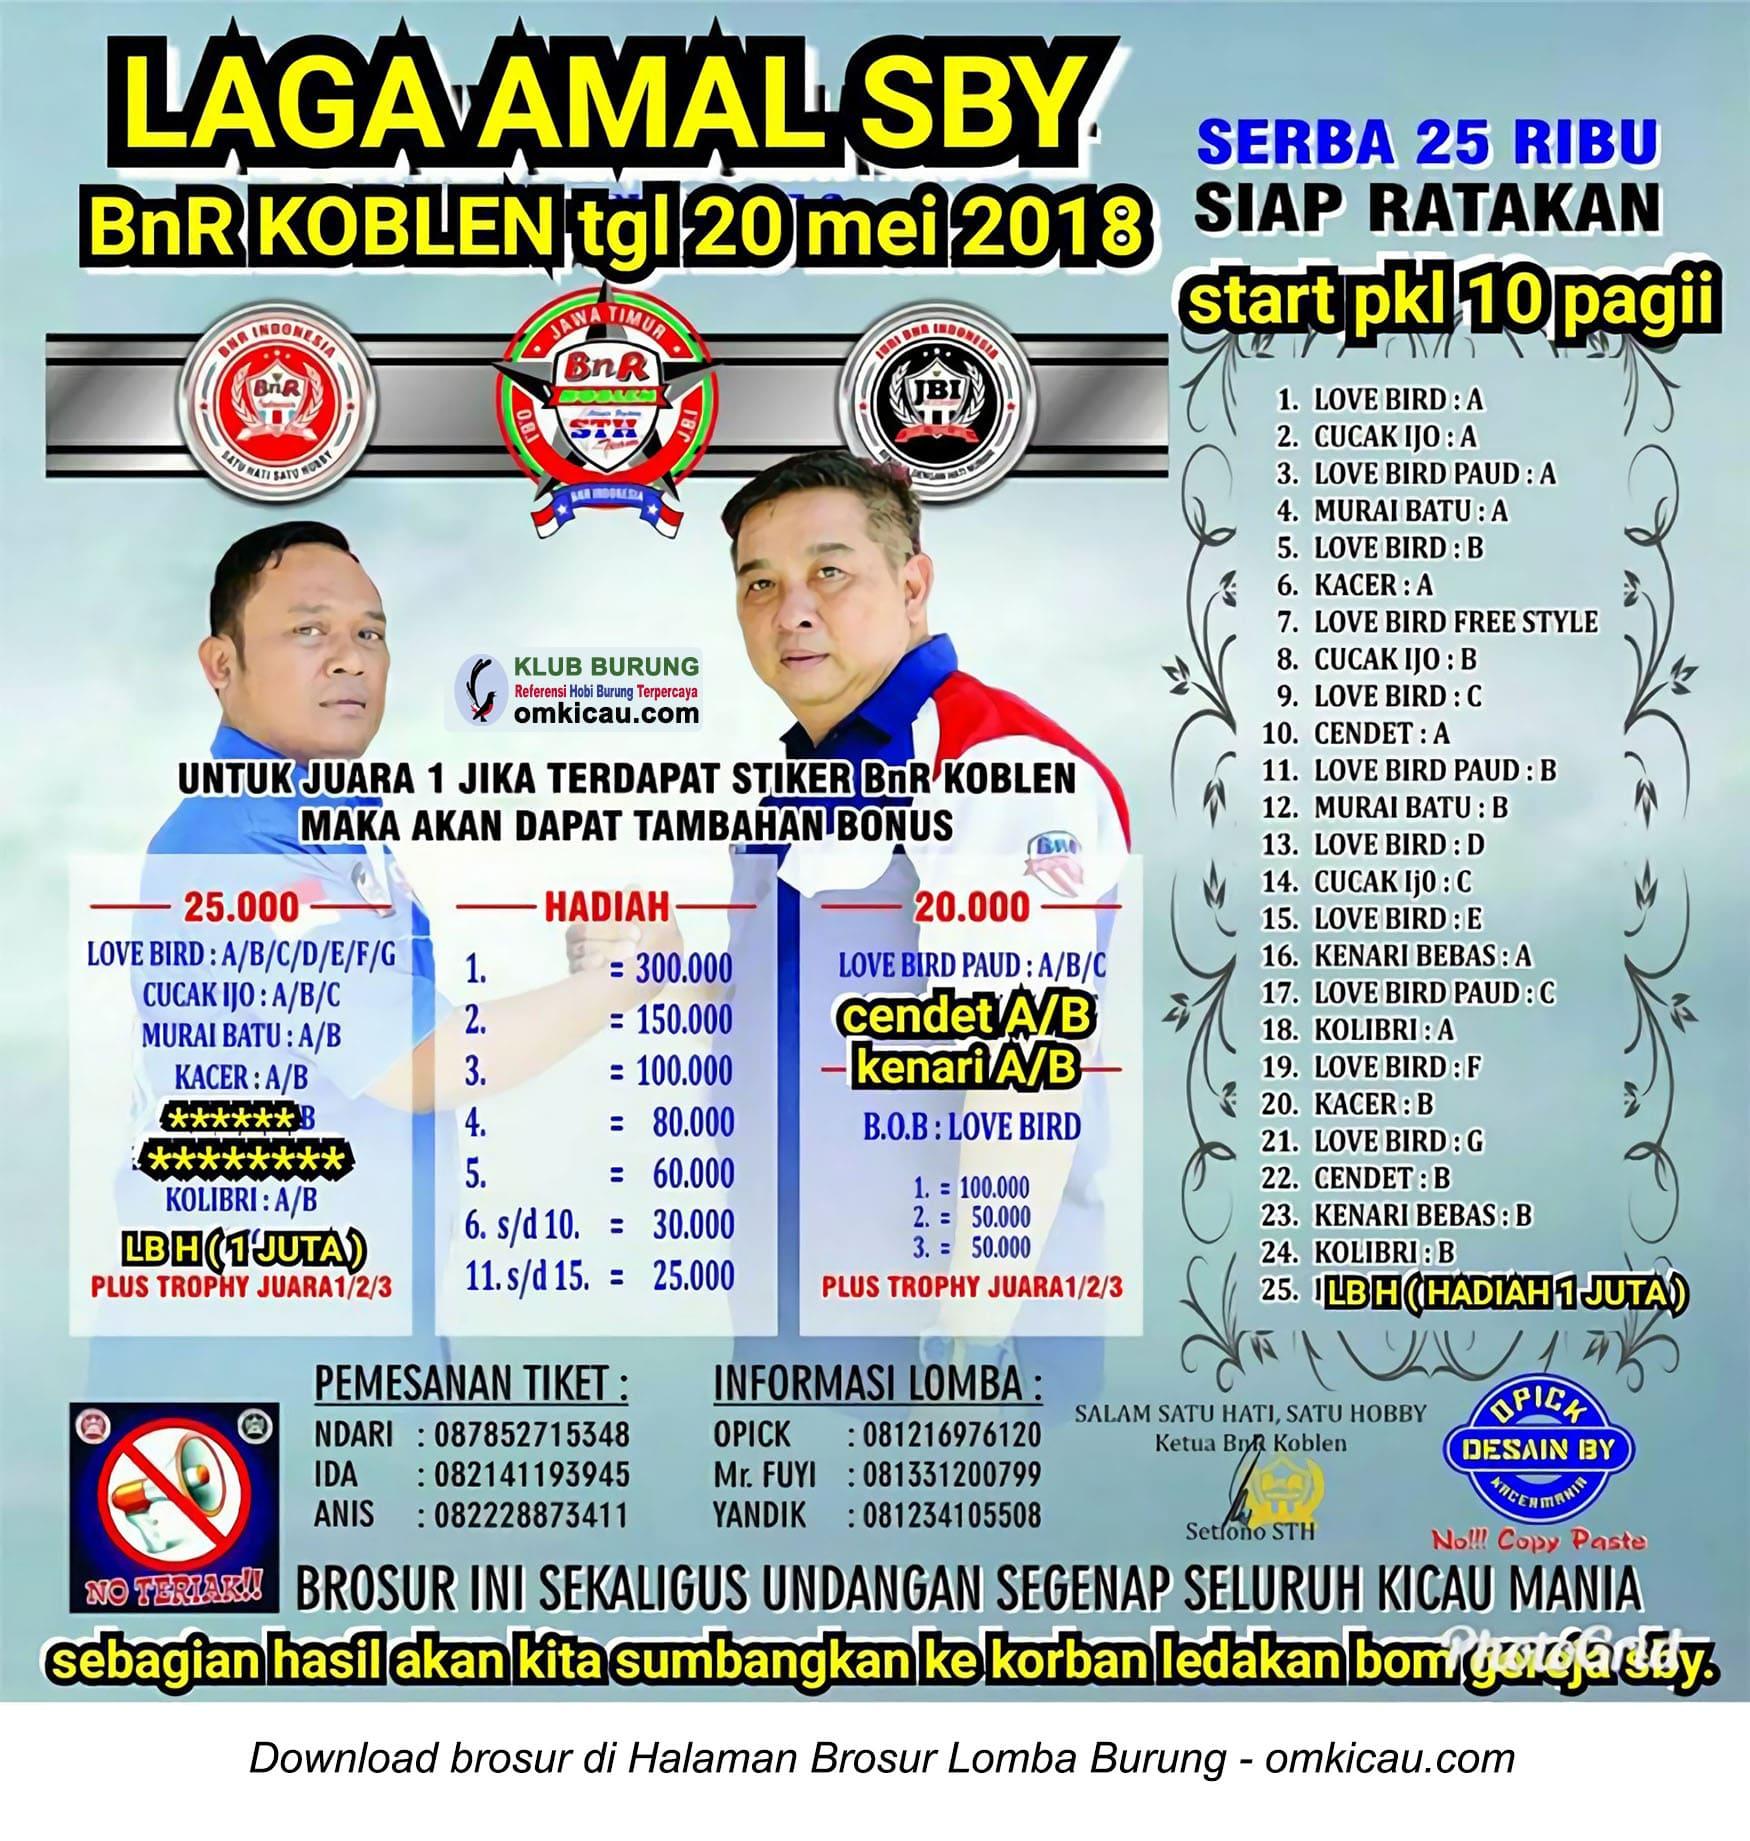 Laga Amal Surabaya BnR Koblen